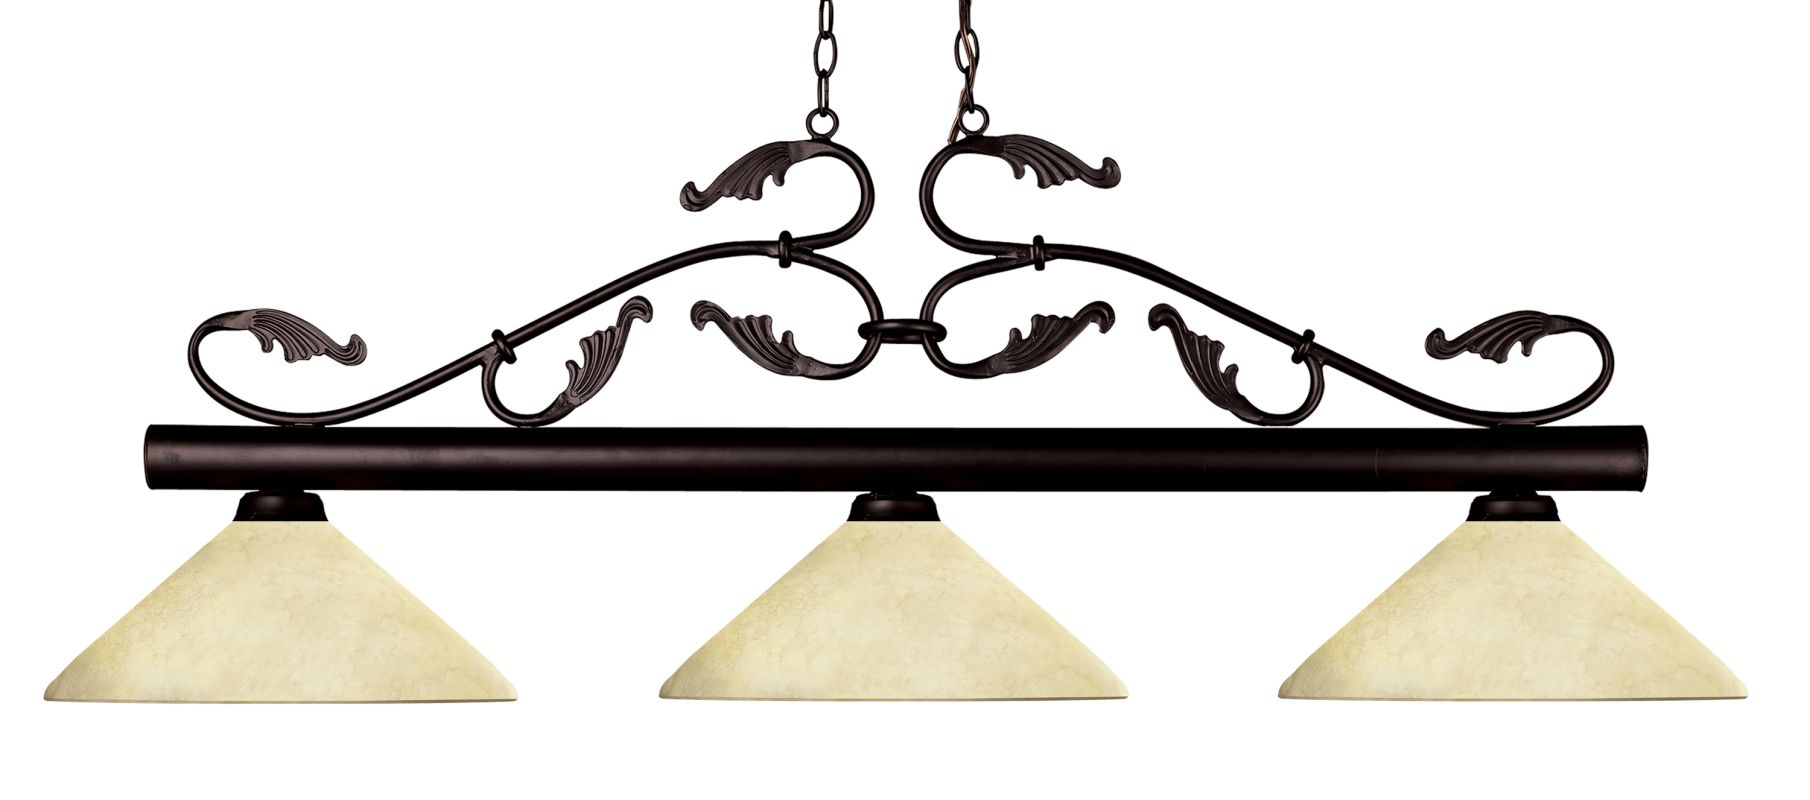 Z-Lite 140-AGM14 Bourbon 3 Light Chandelier with Golden Mottle Glass Sale $416.00 ITEM: bci2519181 ID#:140BRZ-AGM14 UPC: 685659019445 :